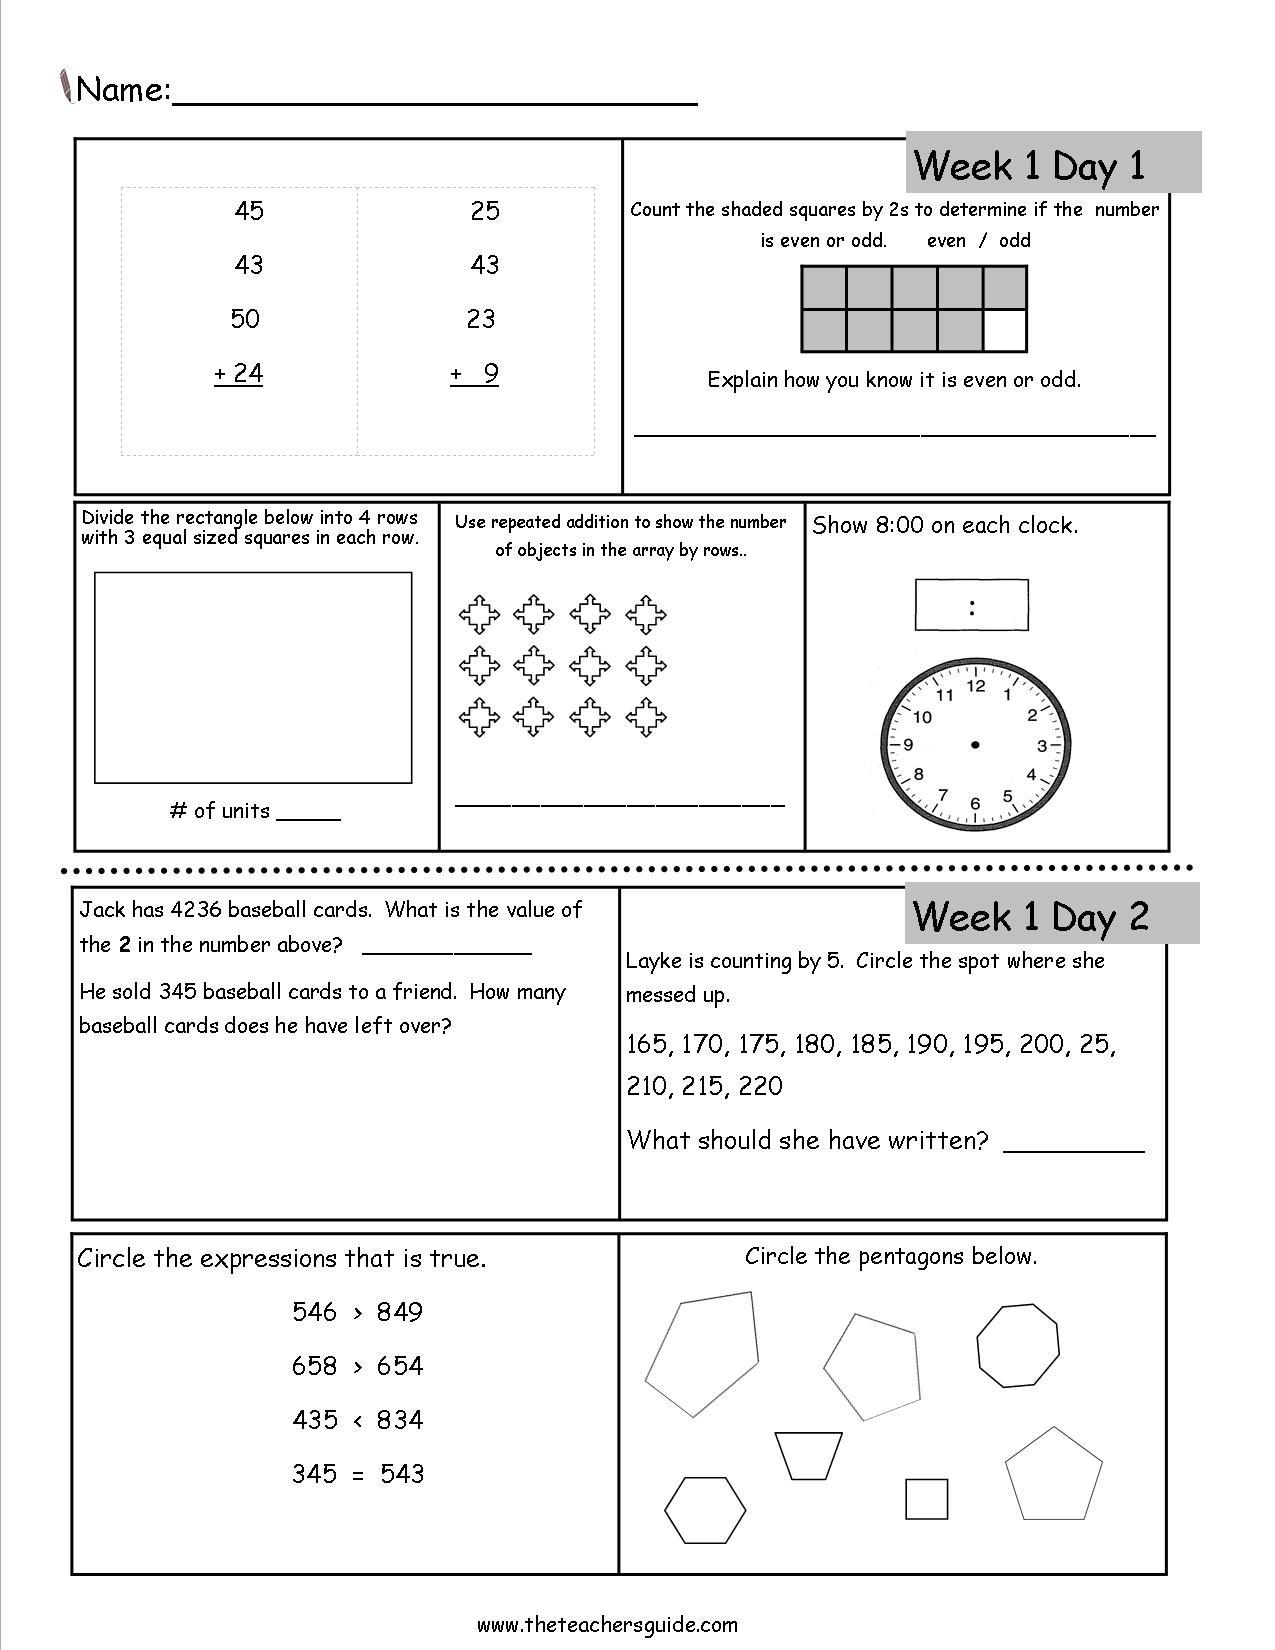 Free 3Rd Grade Daily Math Worksheets - Free Printable Common Core Math Worksheets For Third Grade